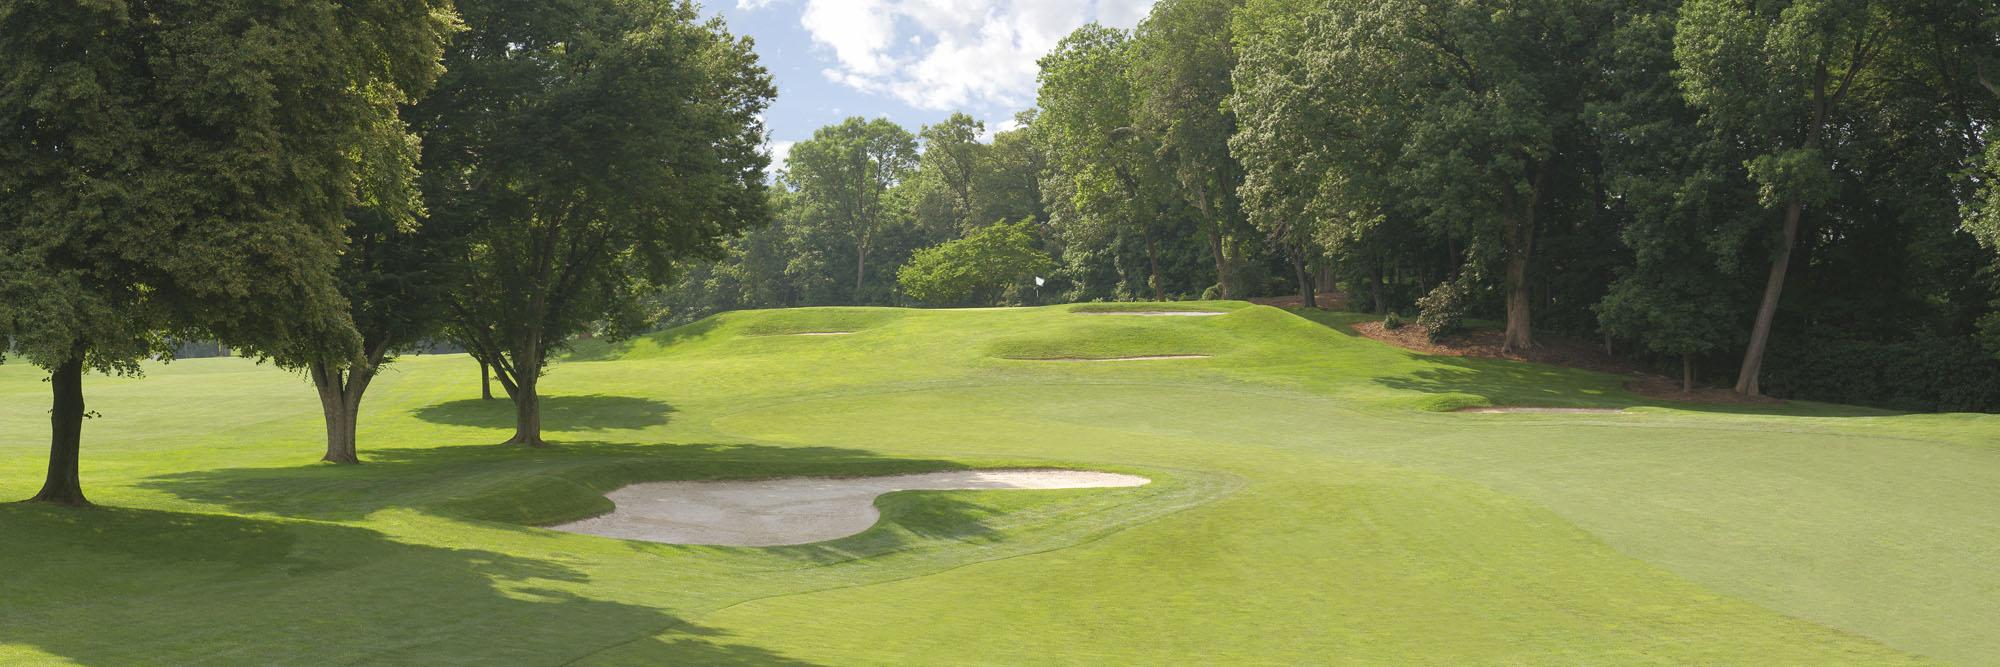 Golf Course Image - Berkshire No. 2